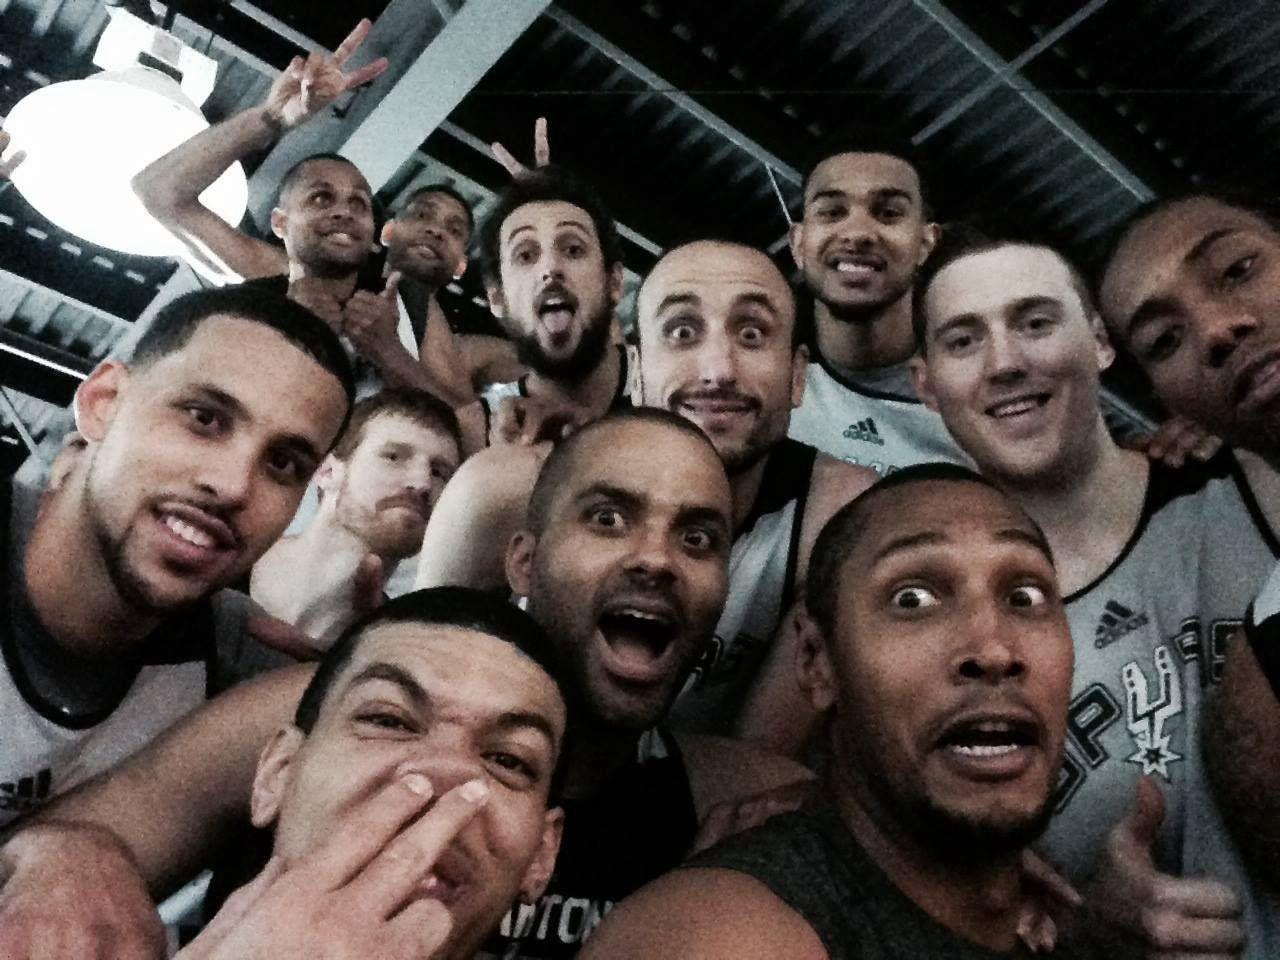 Spurs selfie